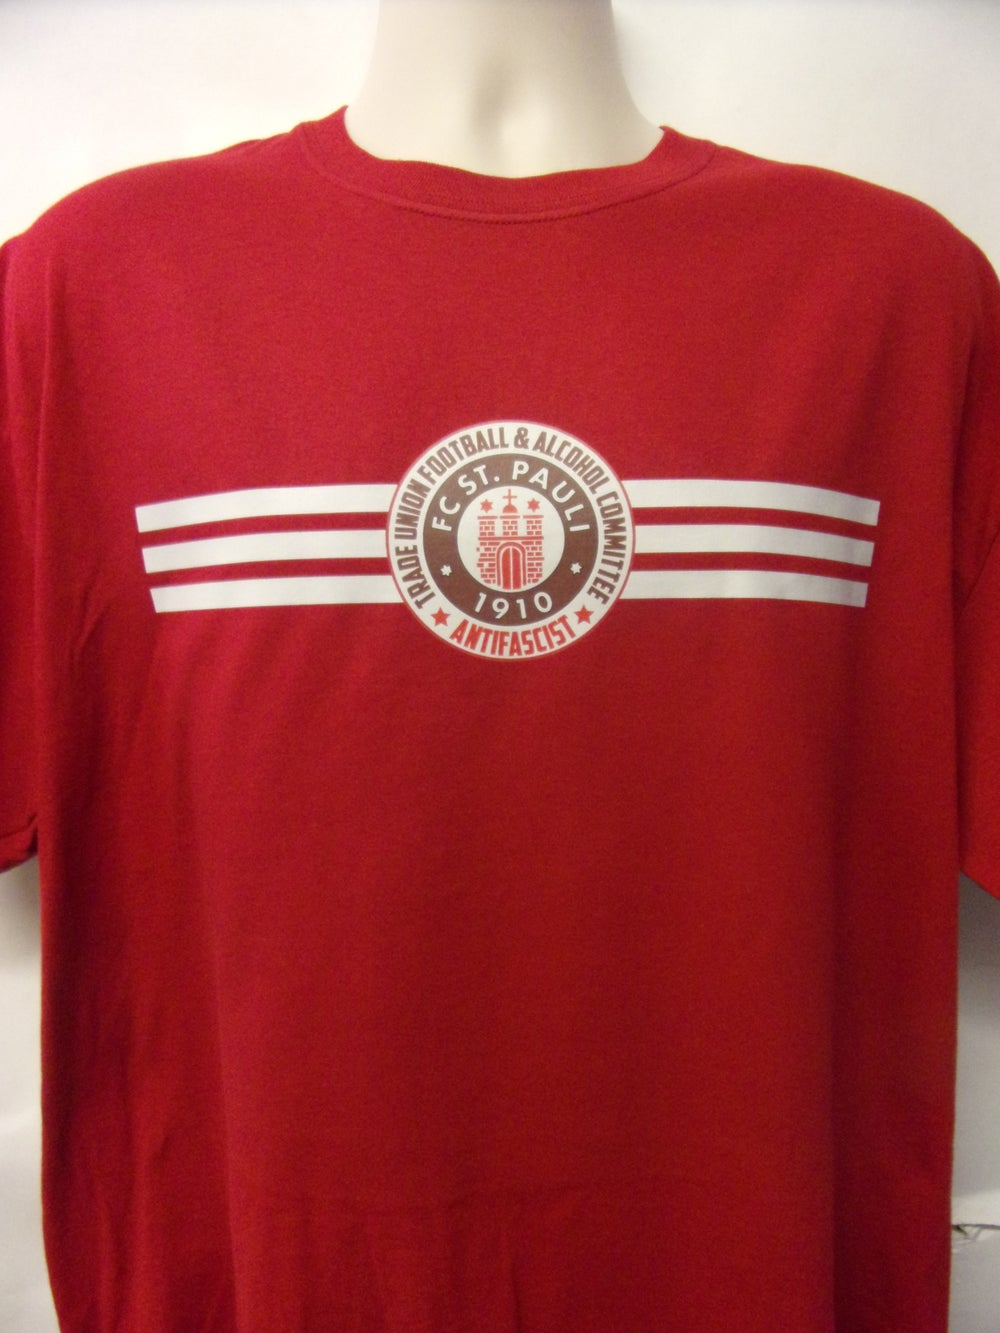 New & Updated: Classic TUFAC St. Pauli